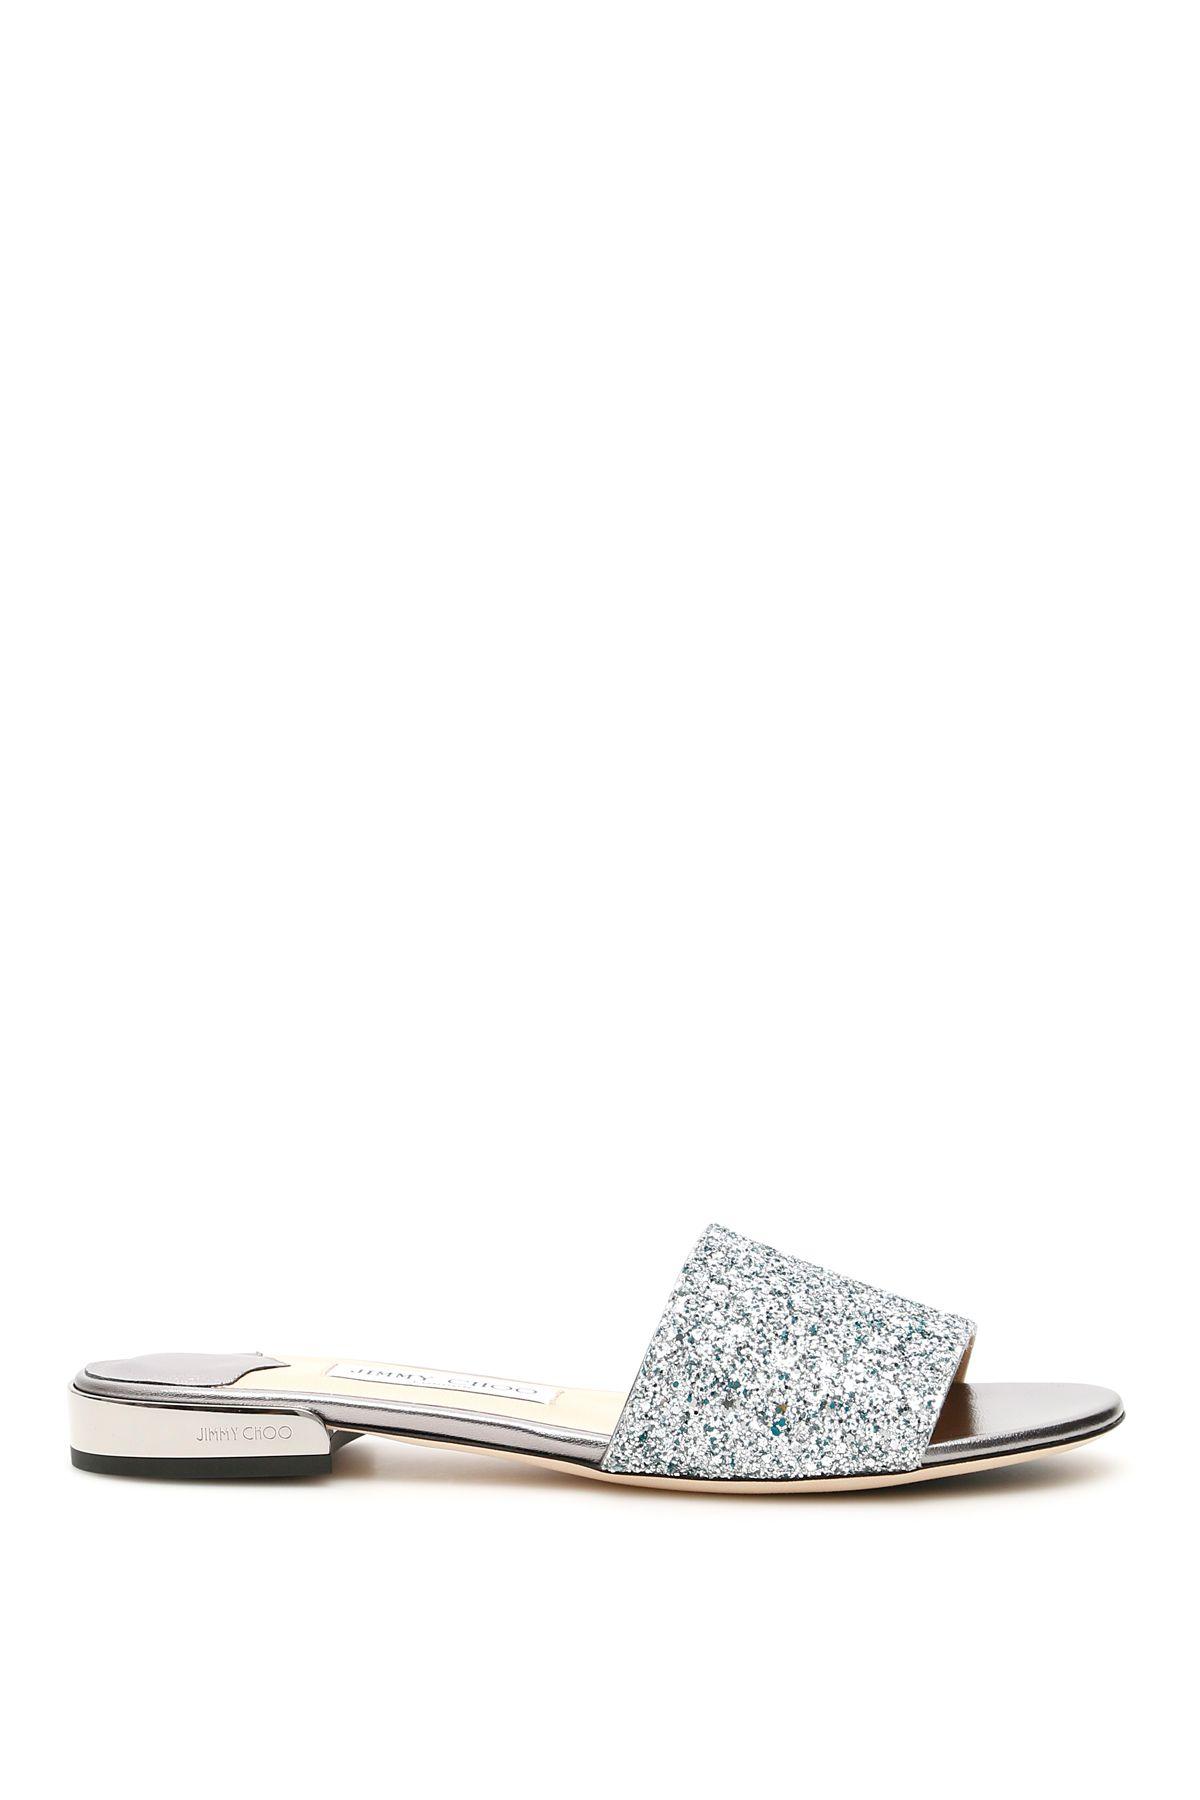 7270fac80fde Jimmy Choo Jimmy Choo Joni Flat Sandals - Basic - 10827540